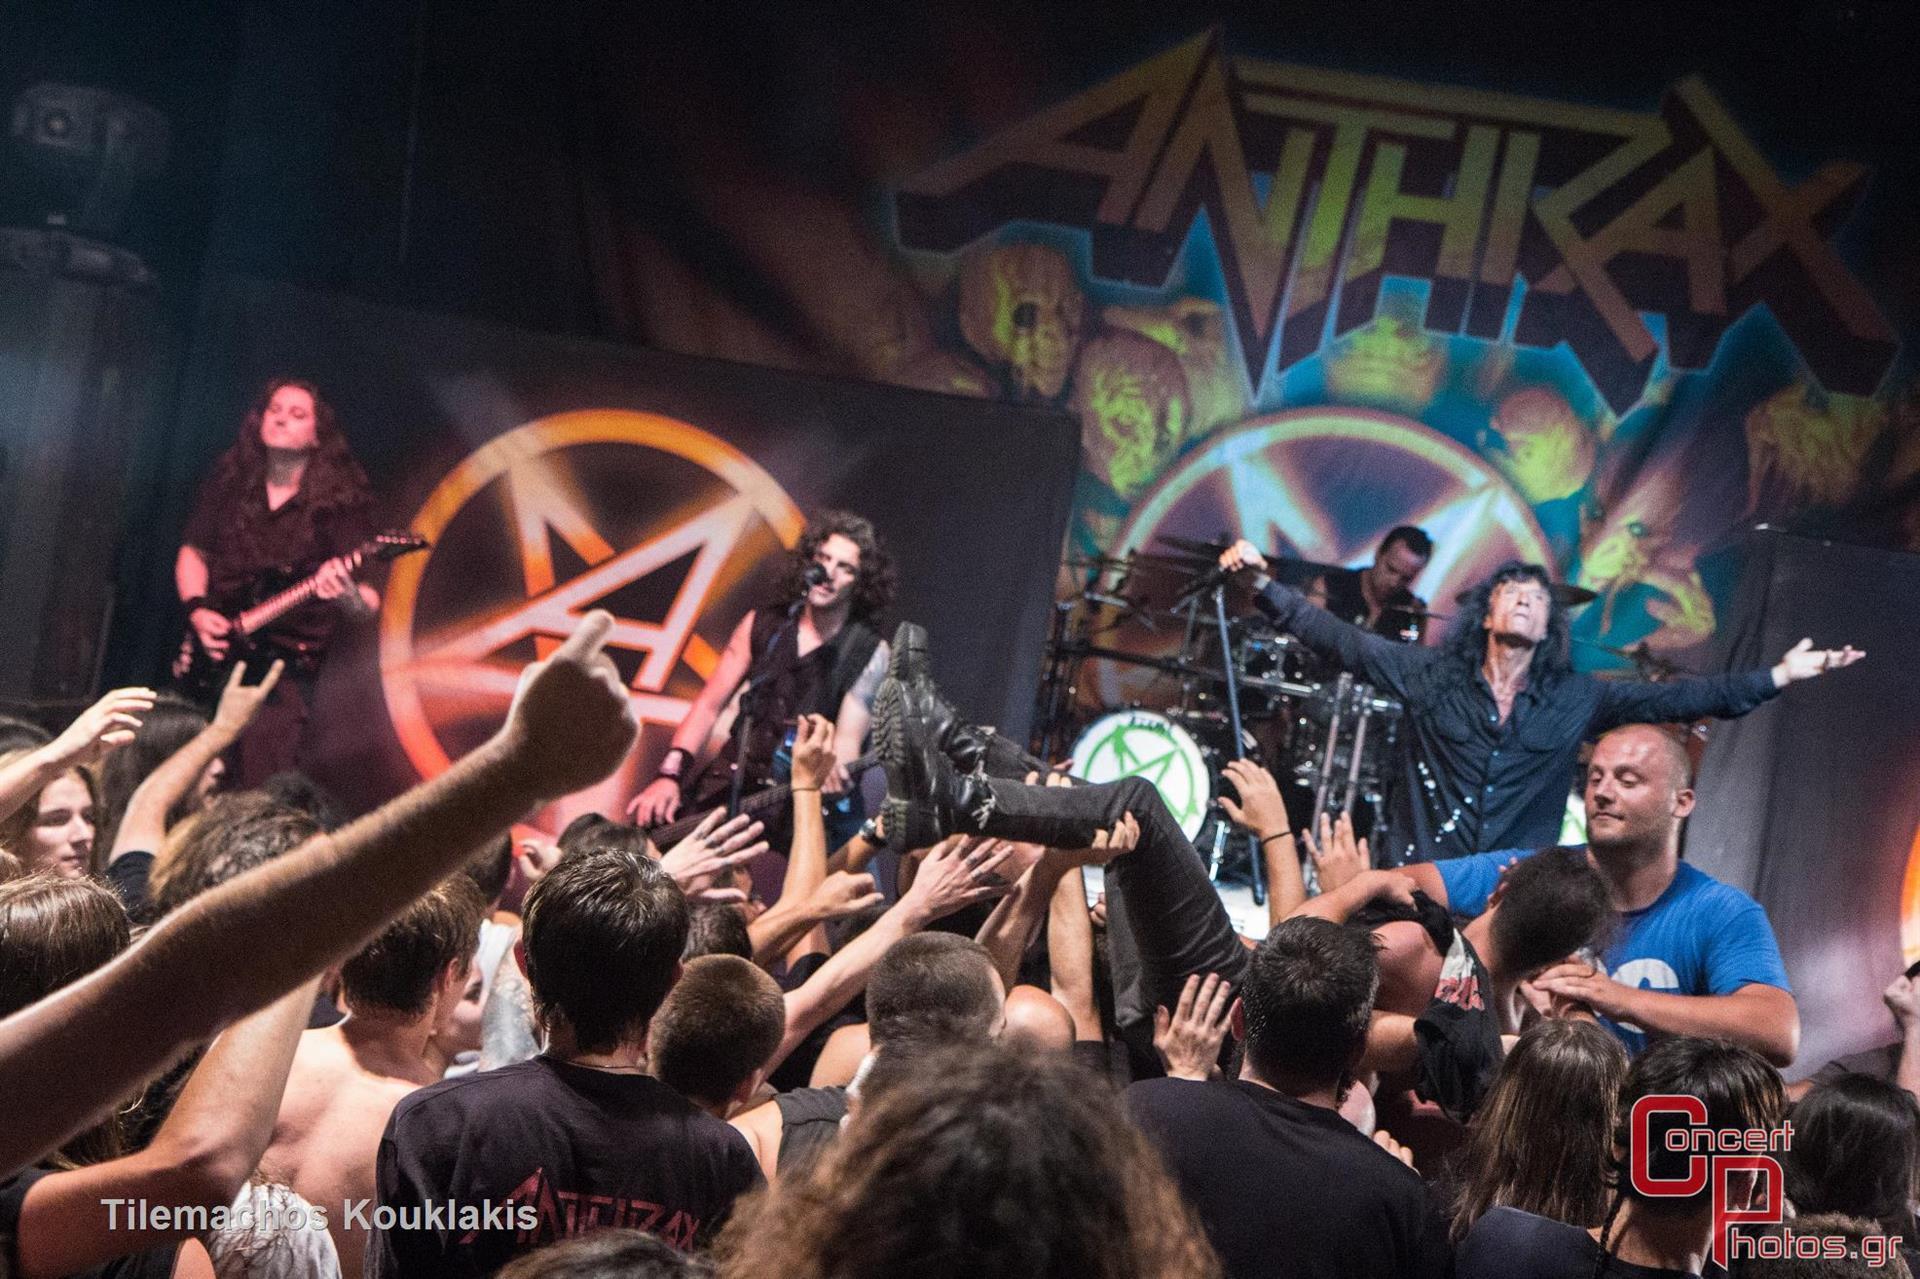 Anthrax-Anthrax photographer: Tilemachos Kouklakis - IMG_2298